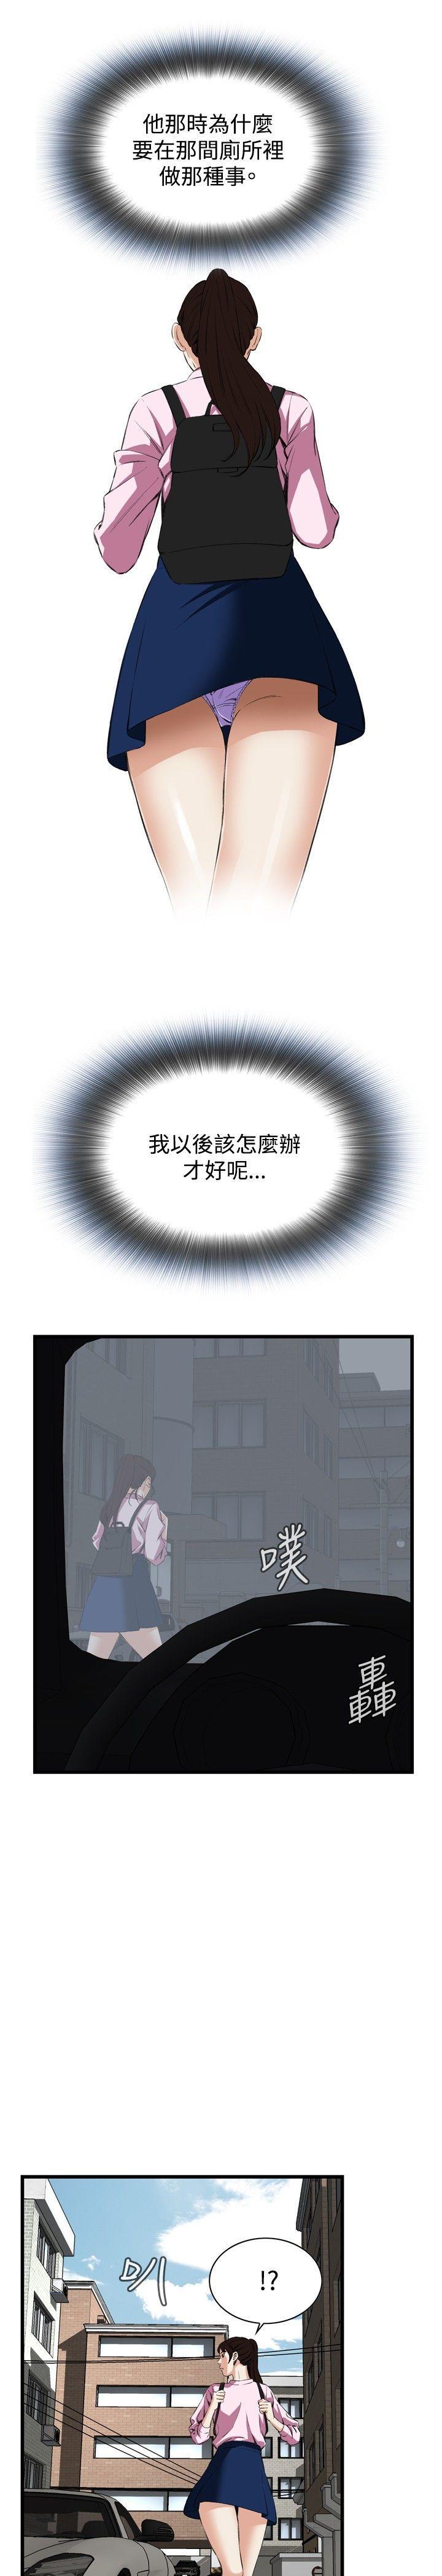 Take a Peek 偷窥 Ch.39~60 [Chinese]中文 507